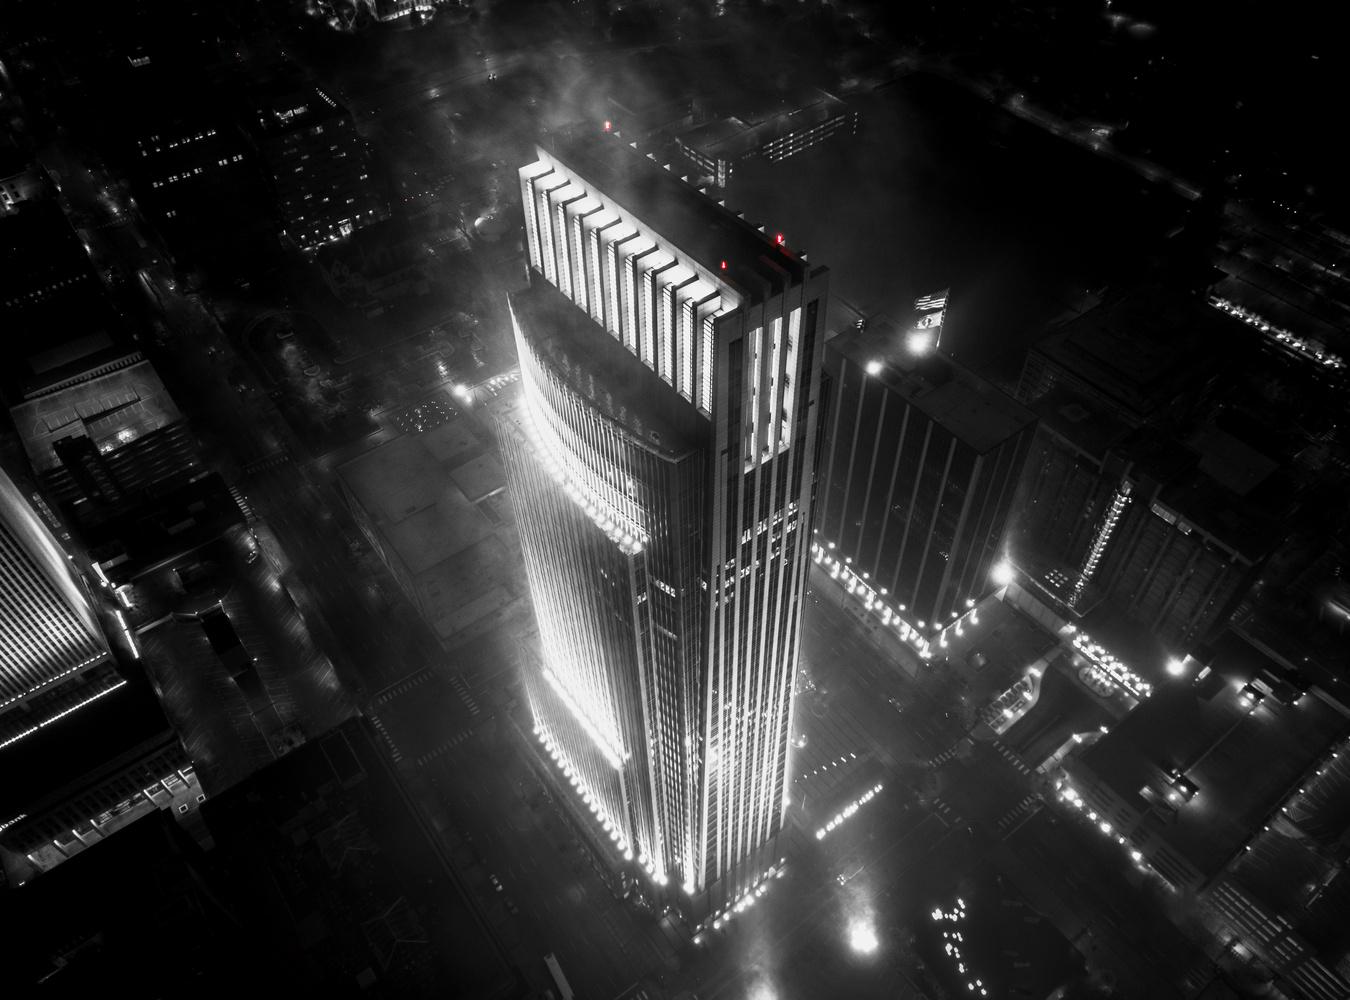 noir by Simeon Pratt